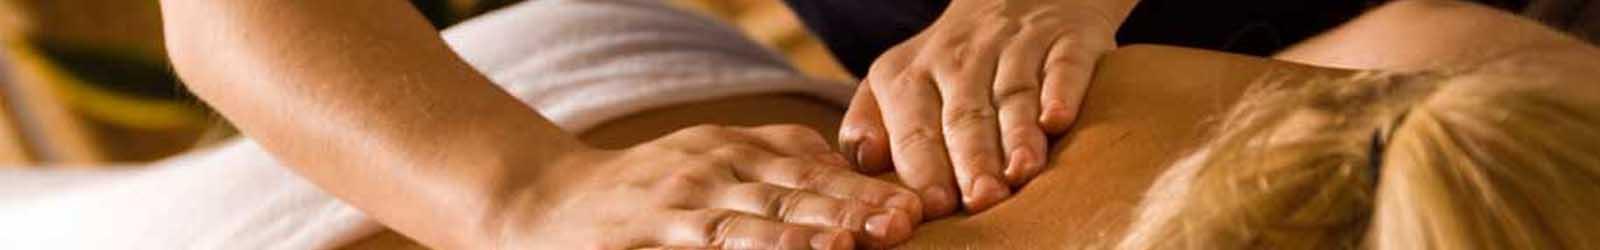 The Massage Station, Professional Massage Therapy, Greensboro NC